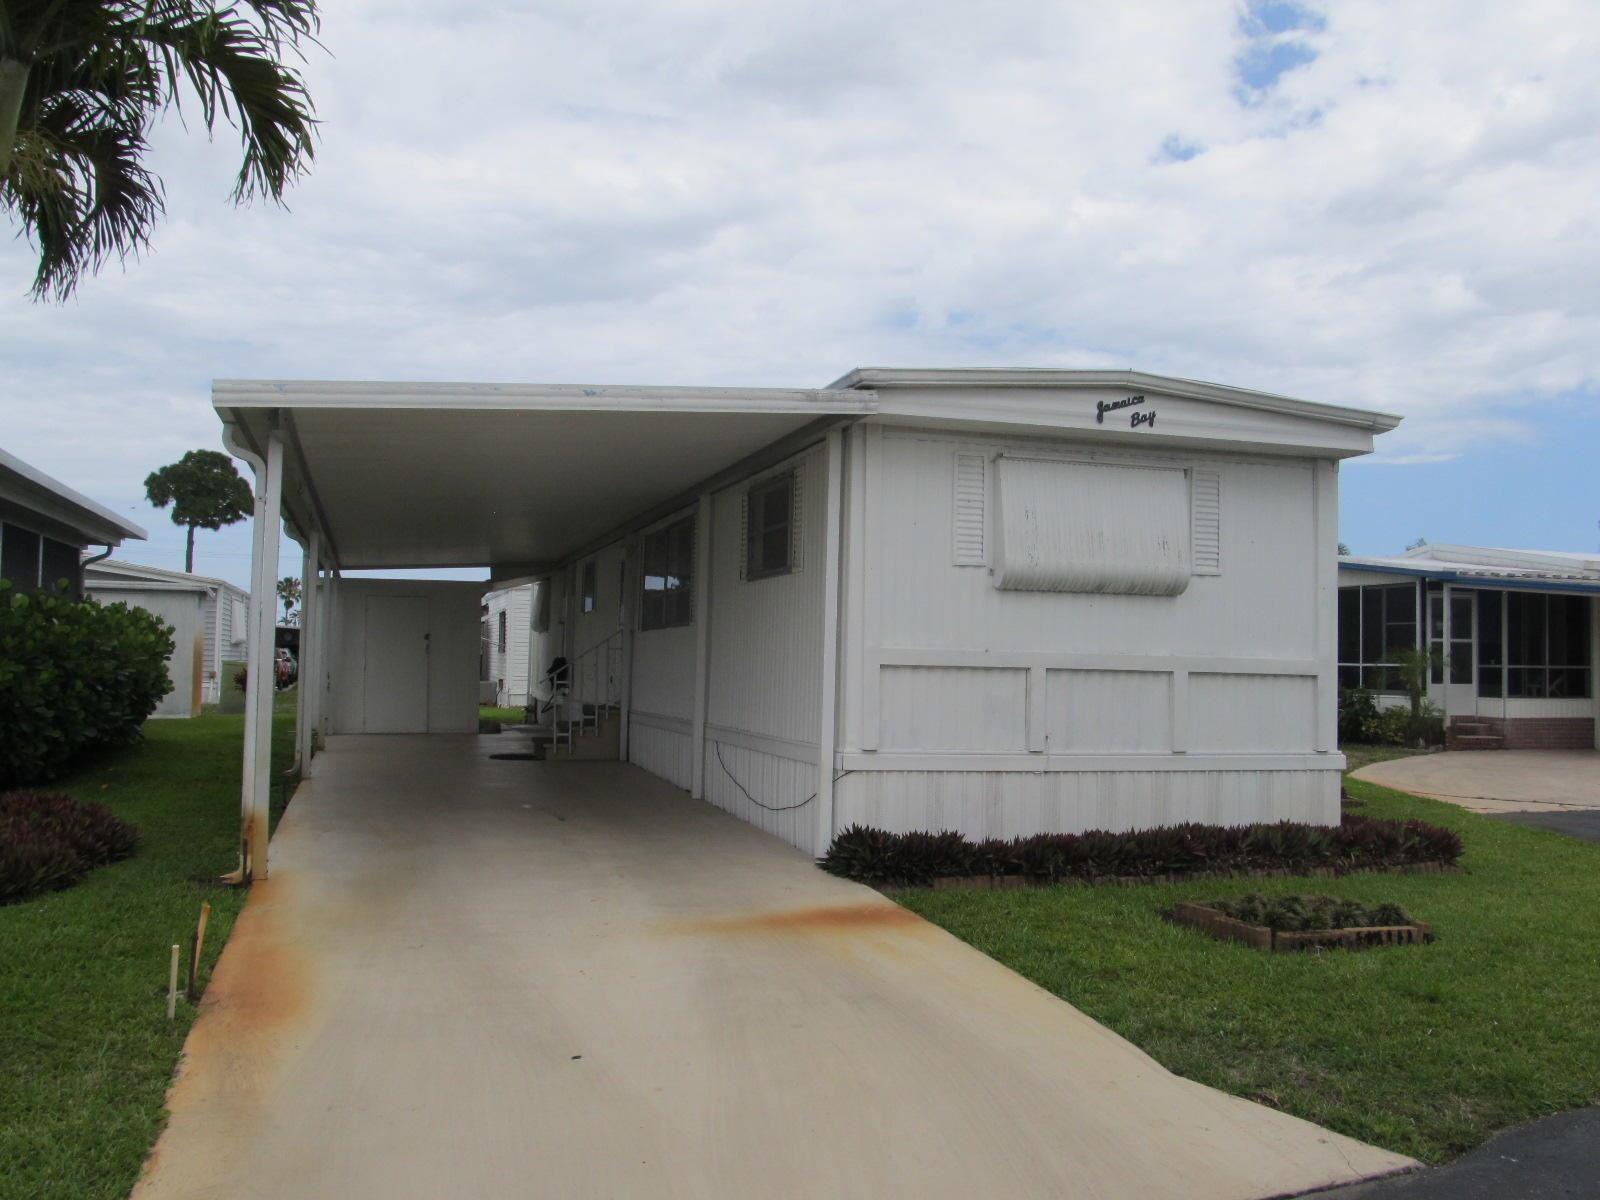 13021 Janico Bay, Boynton Beach, FL 33436 - MLS#: RX-10712419